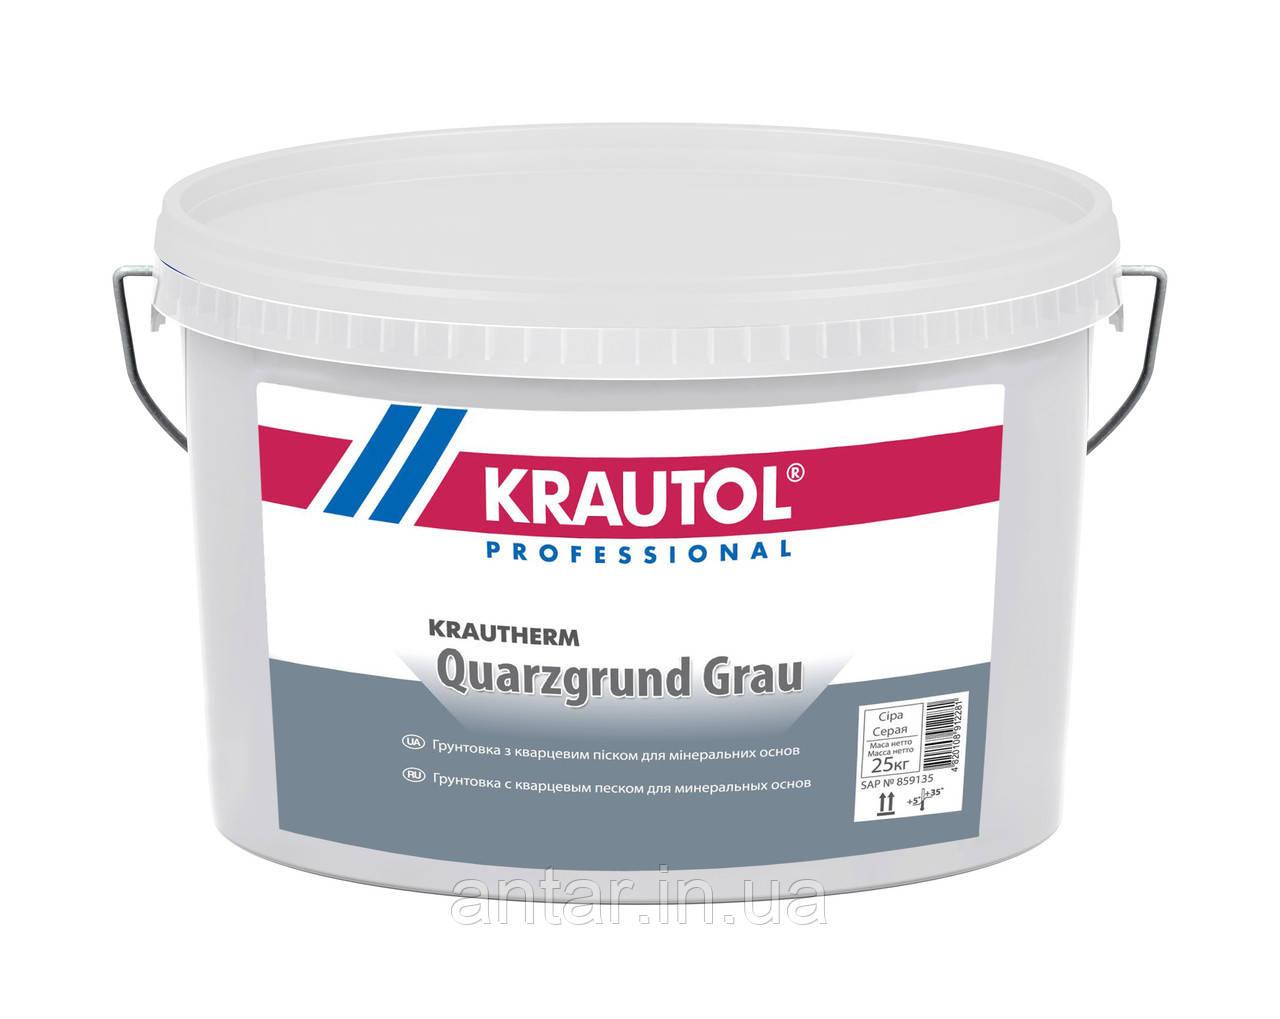 krautherm quarzgrund grau - грунтовка с кварцевым песком серая (25кг